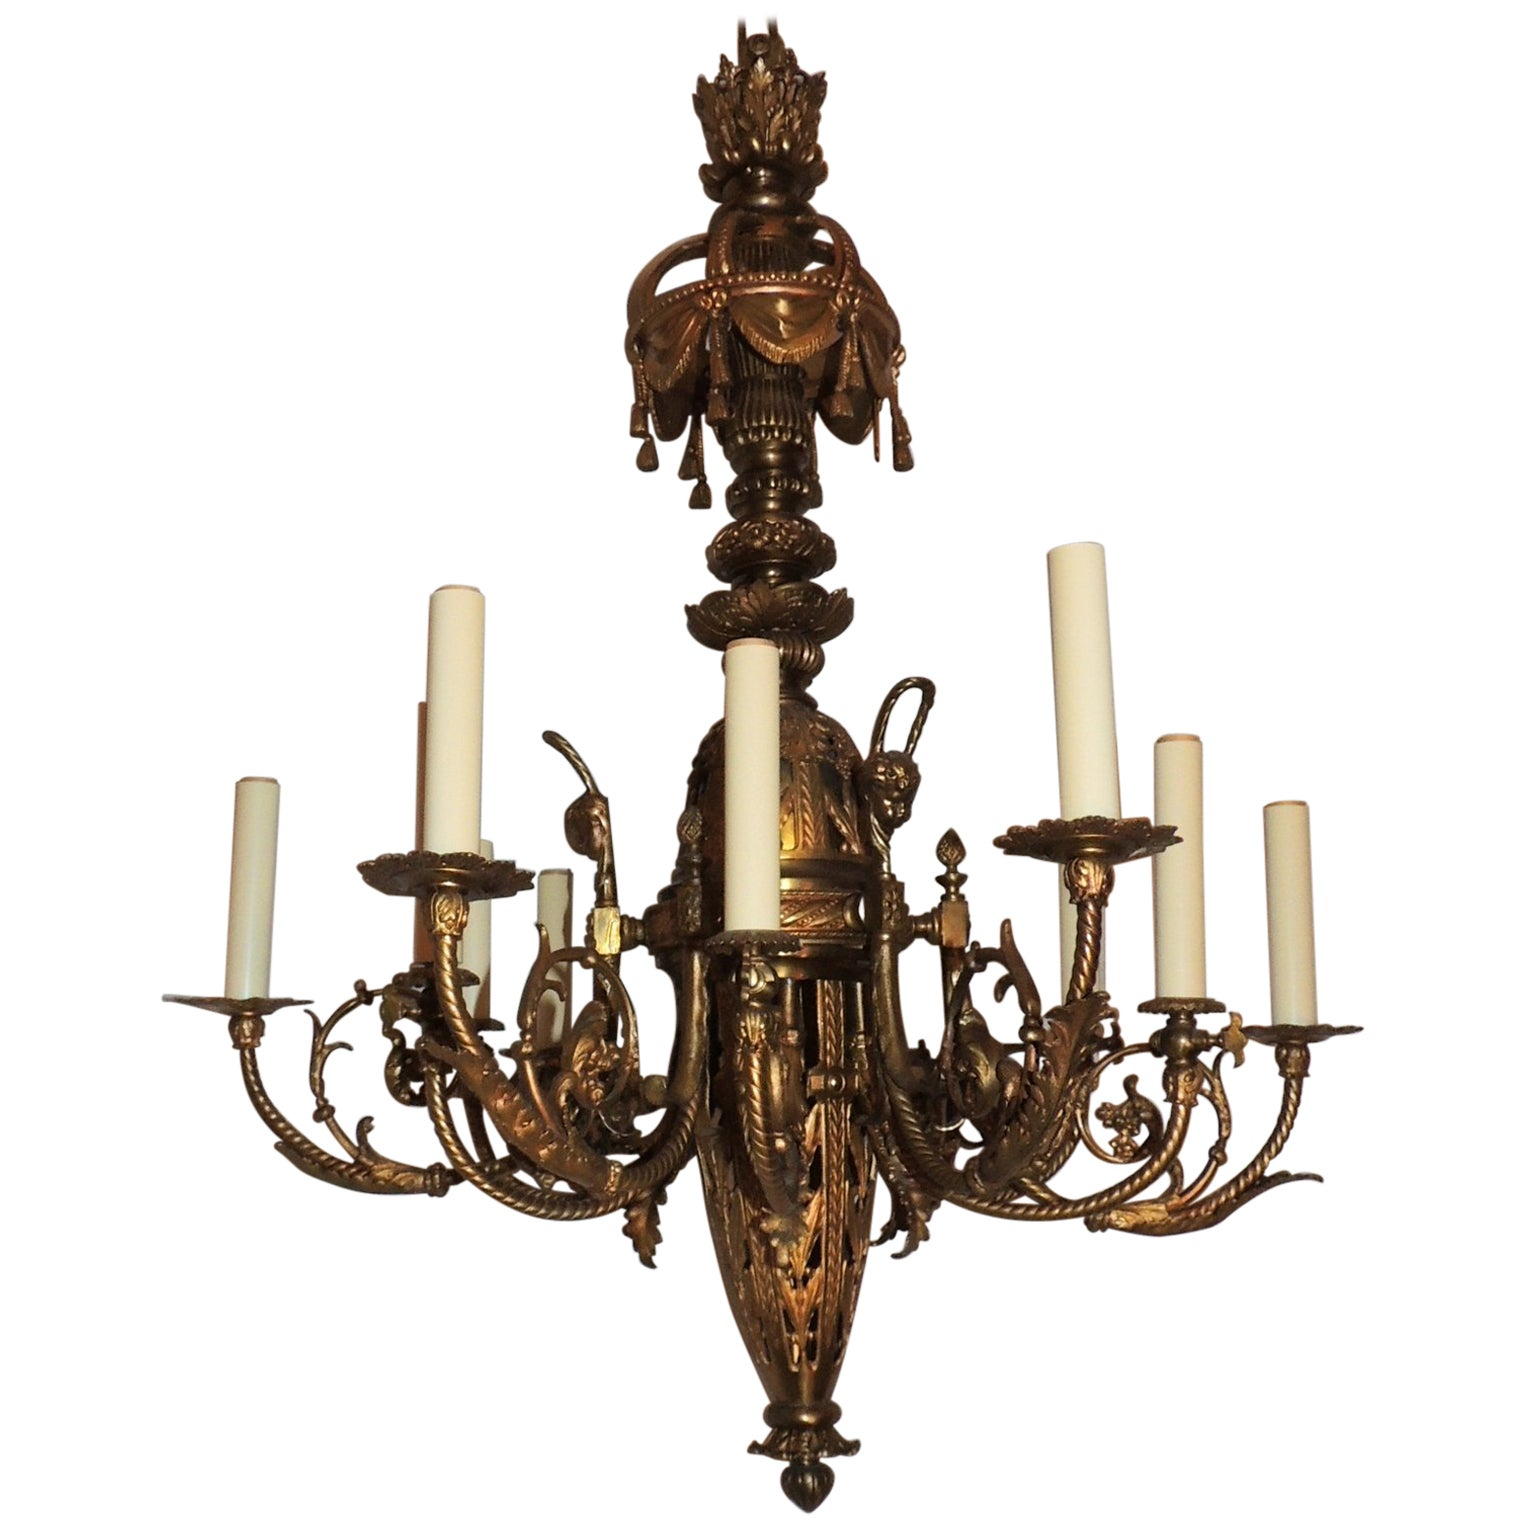 French Empire Neoclassical Doré Bronze Twelve-Light Tassel Chandelier Fixture